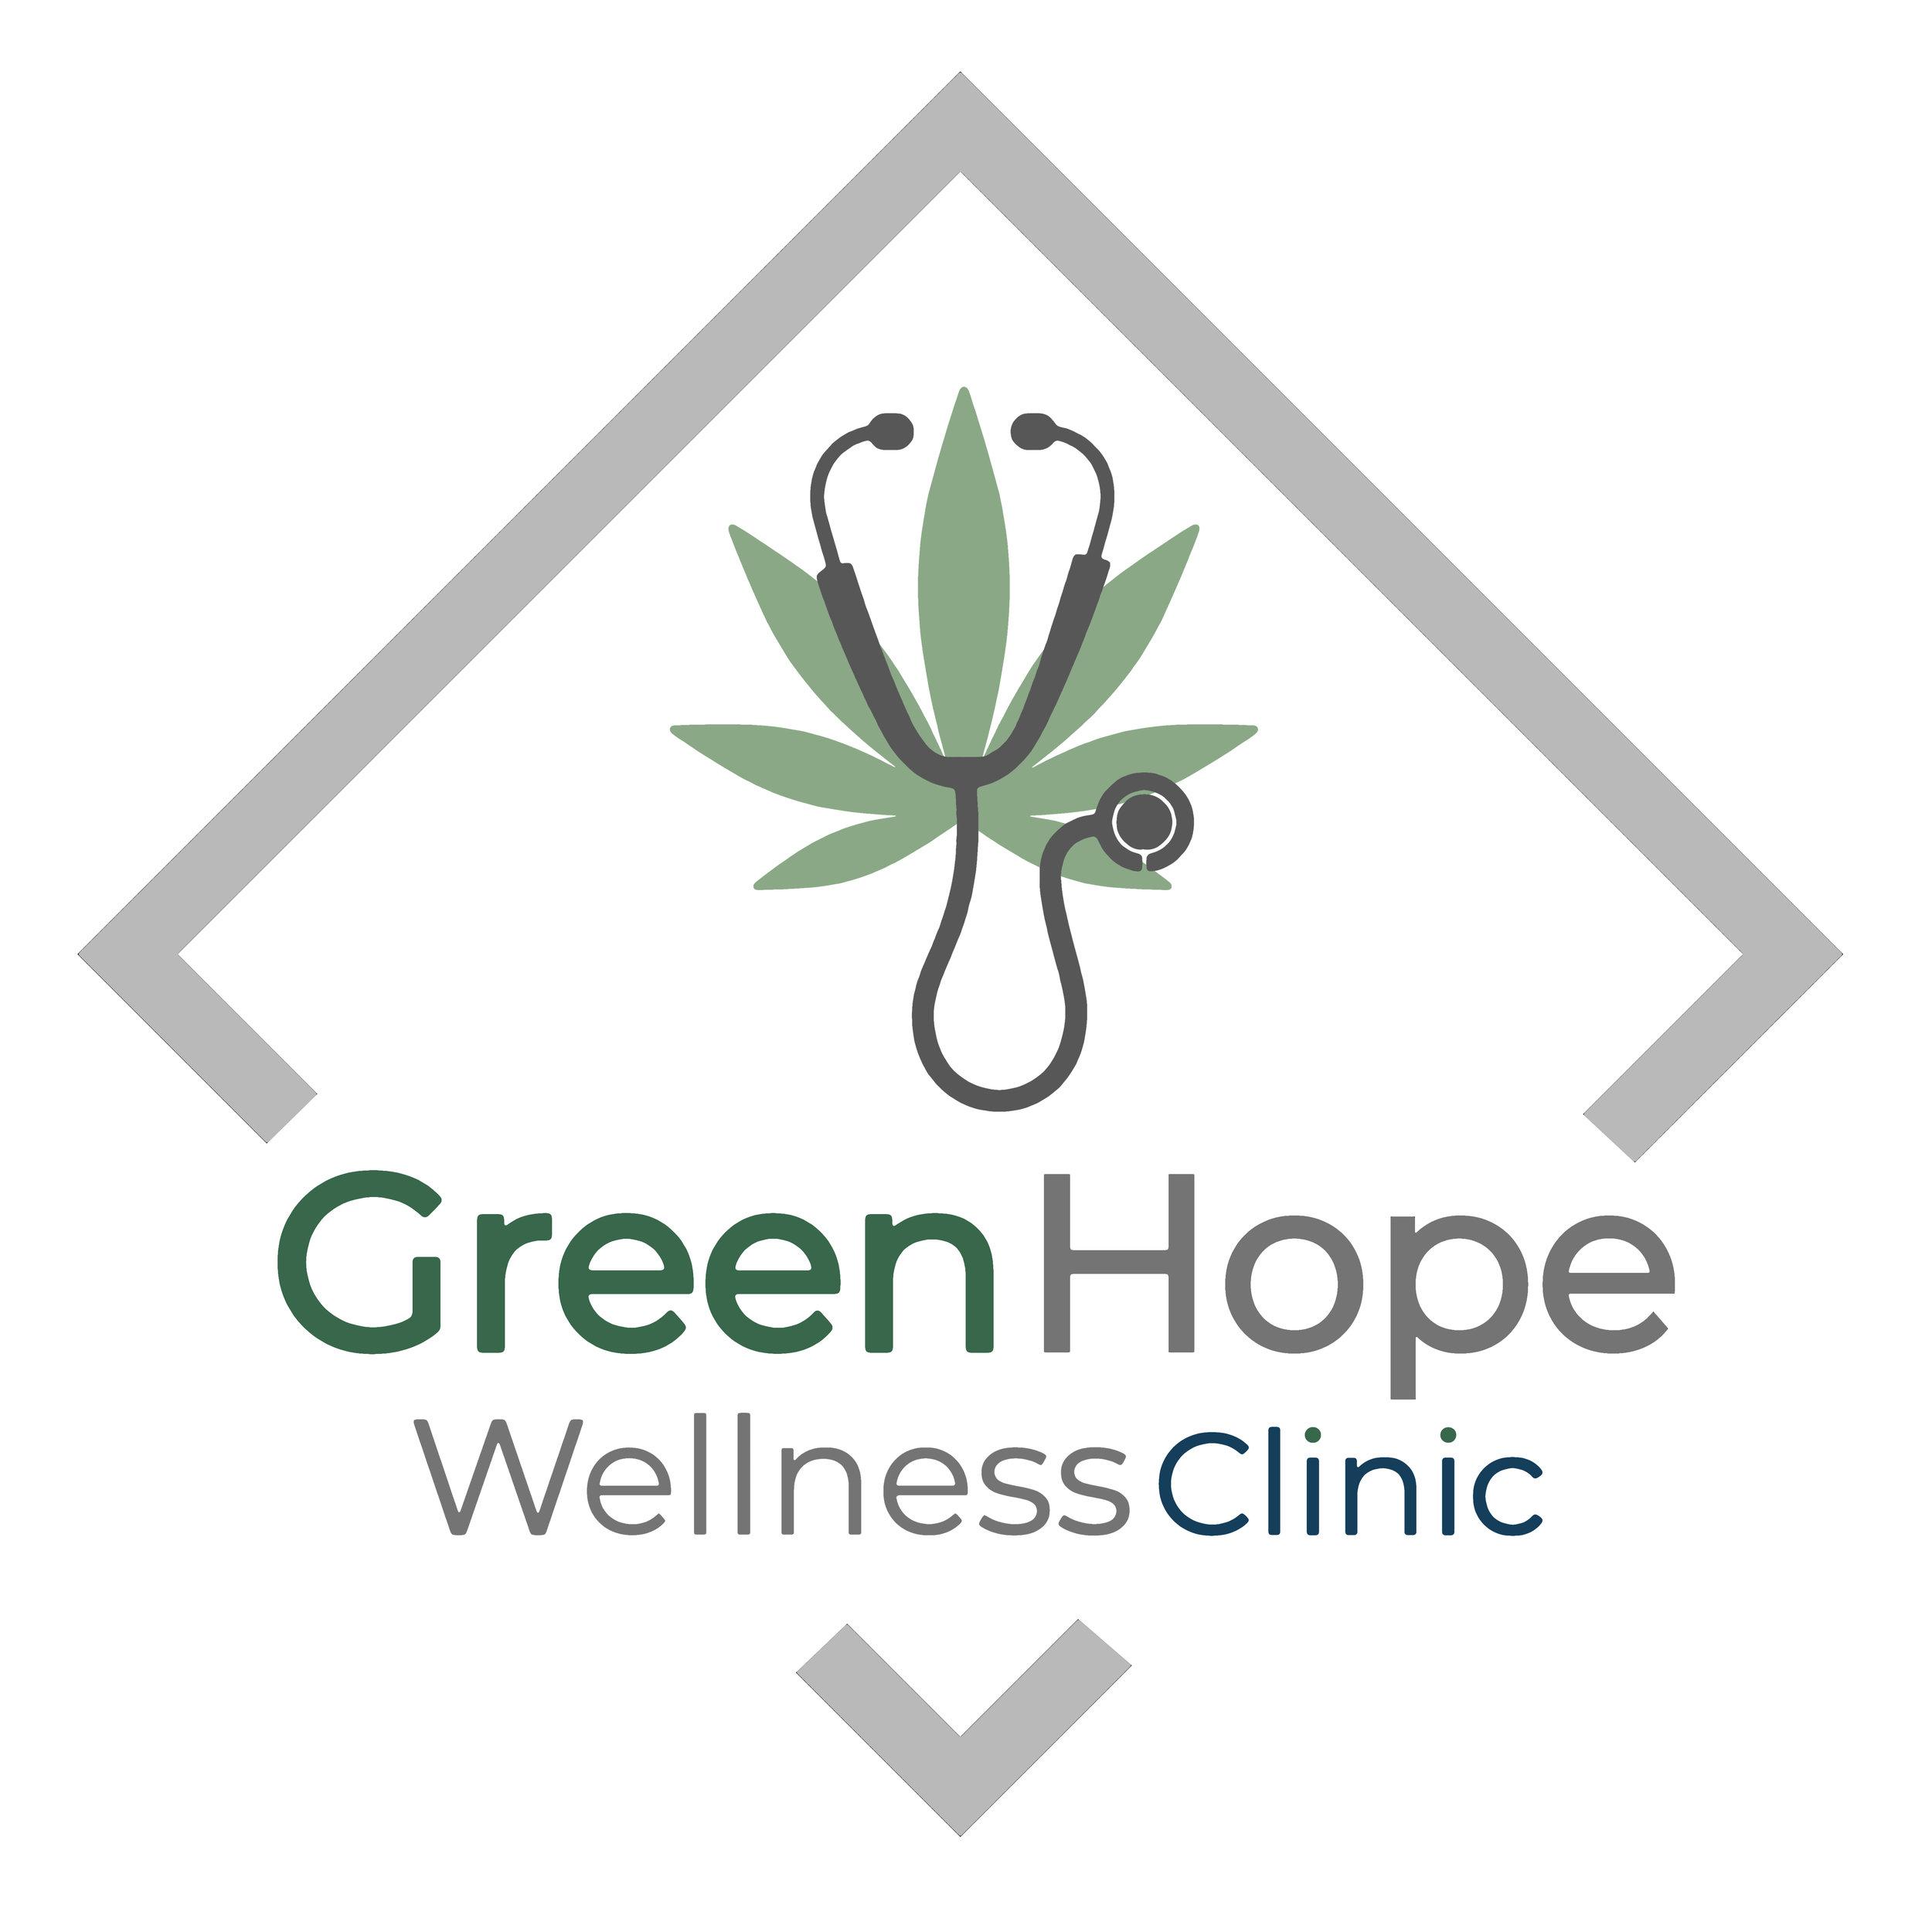 Green Hope-logo-3.jpg